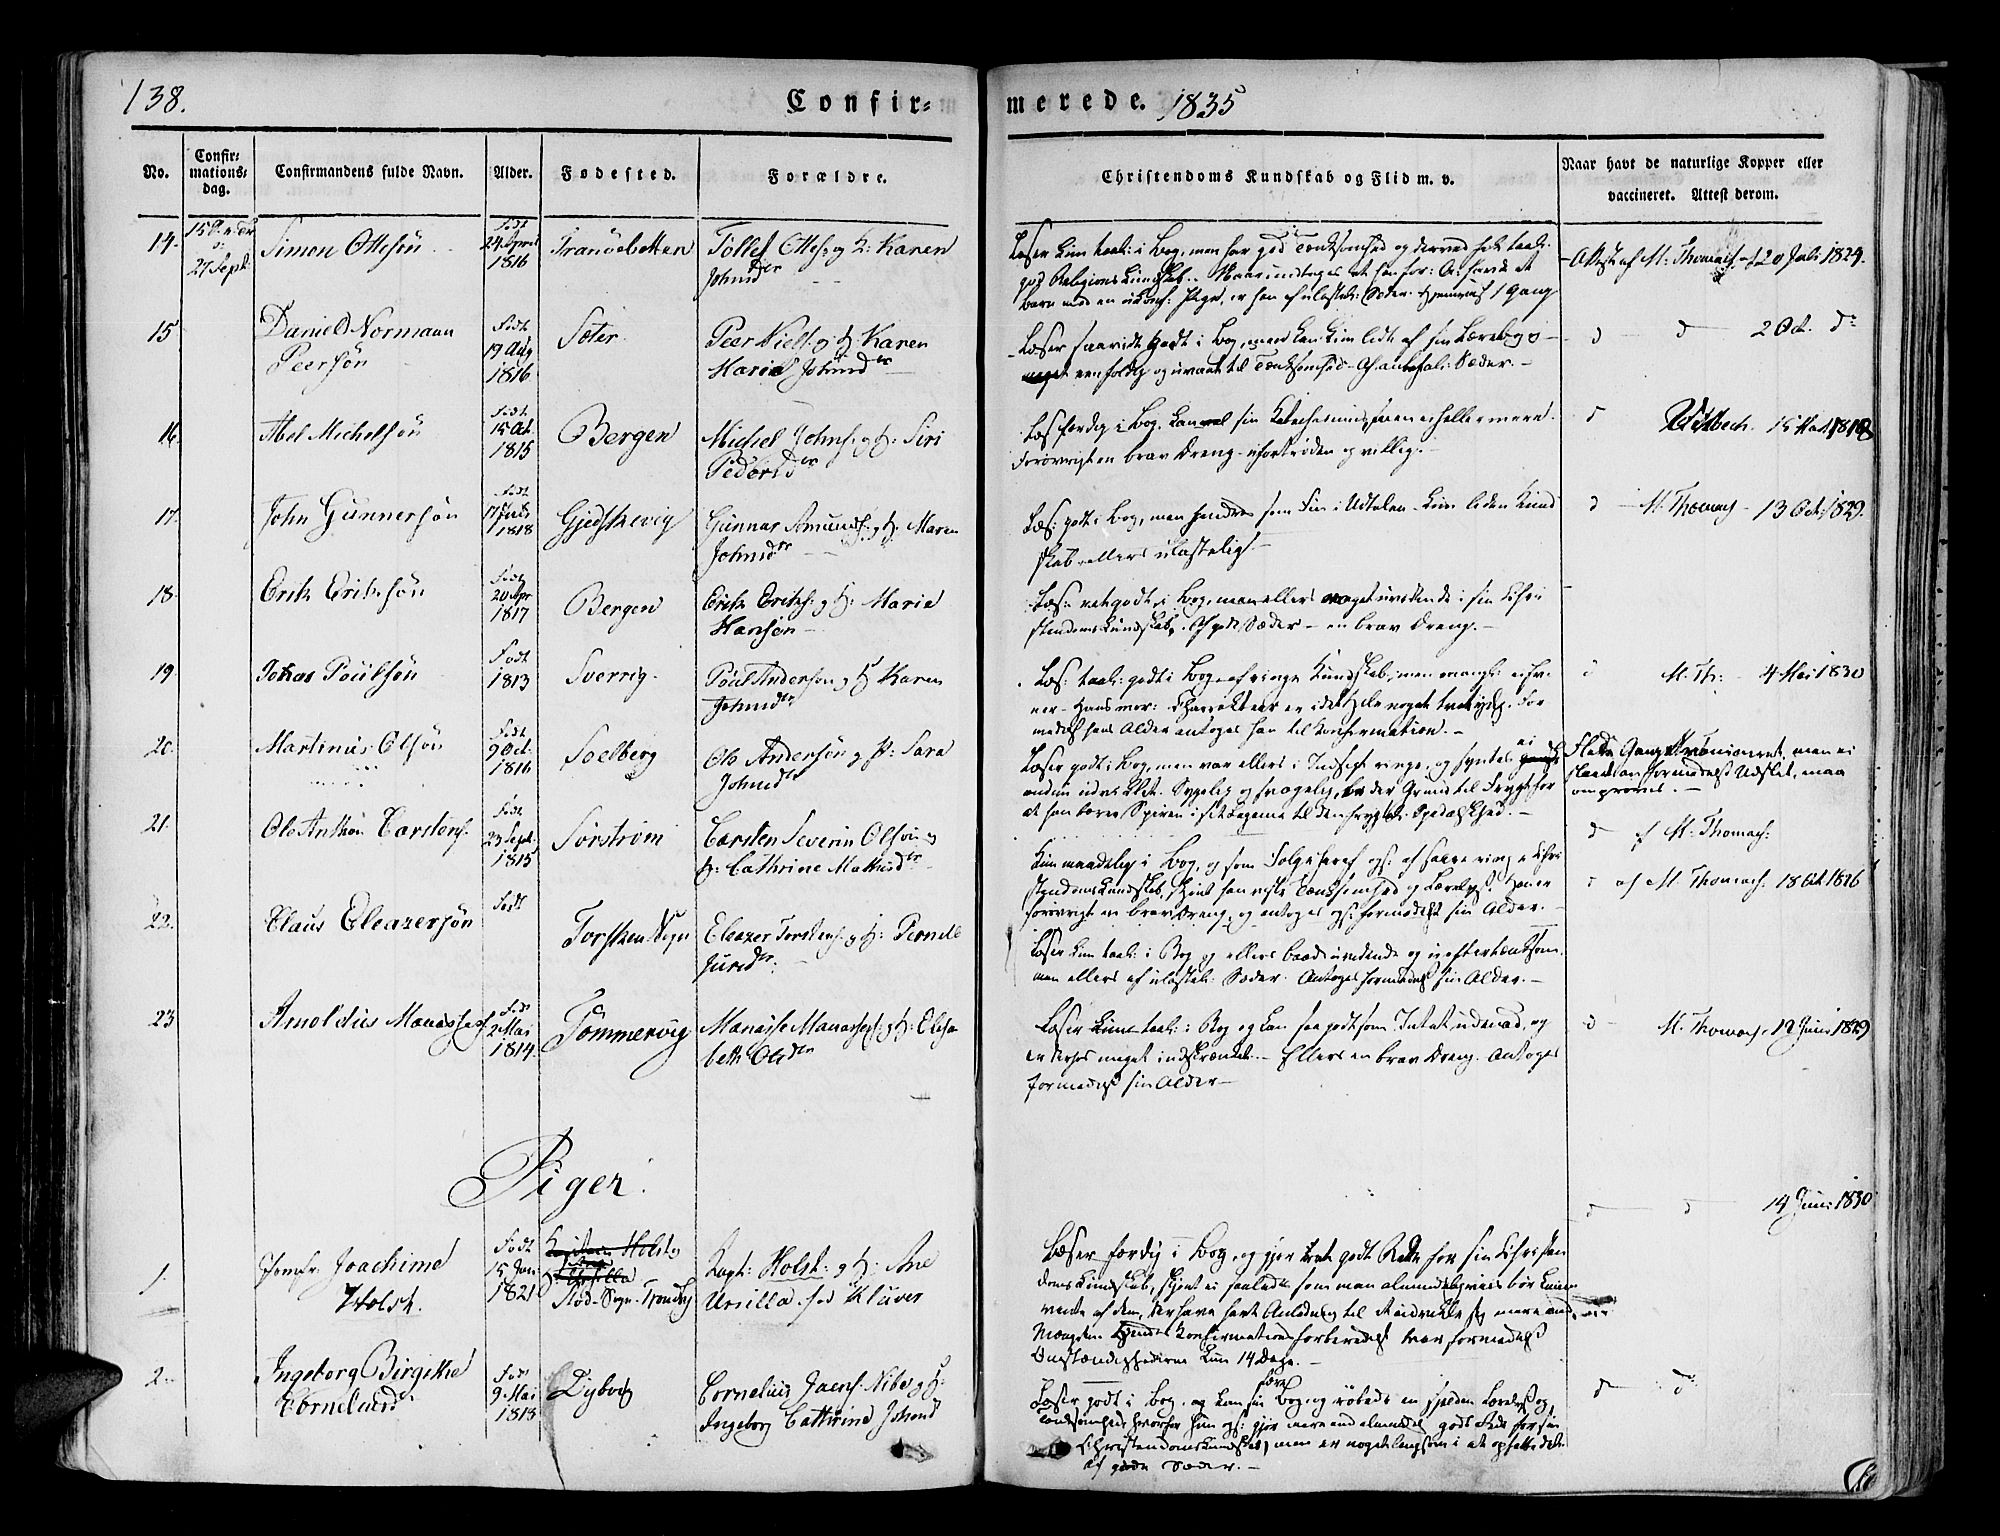 SATØ, Tranøy sokneprestkontor, I/Ia/Iaa/L0005kirke: Ministerialbok nr. 5, 1829-1844, s. 138